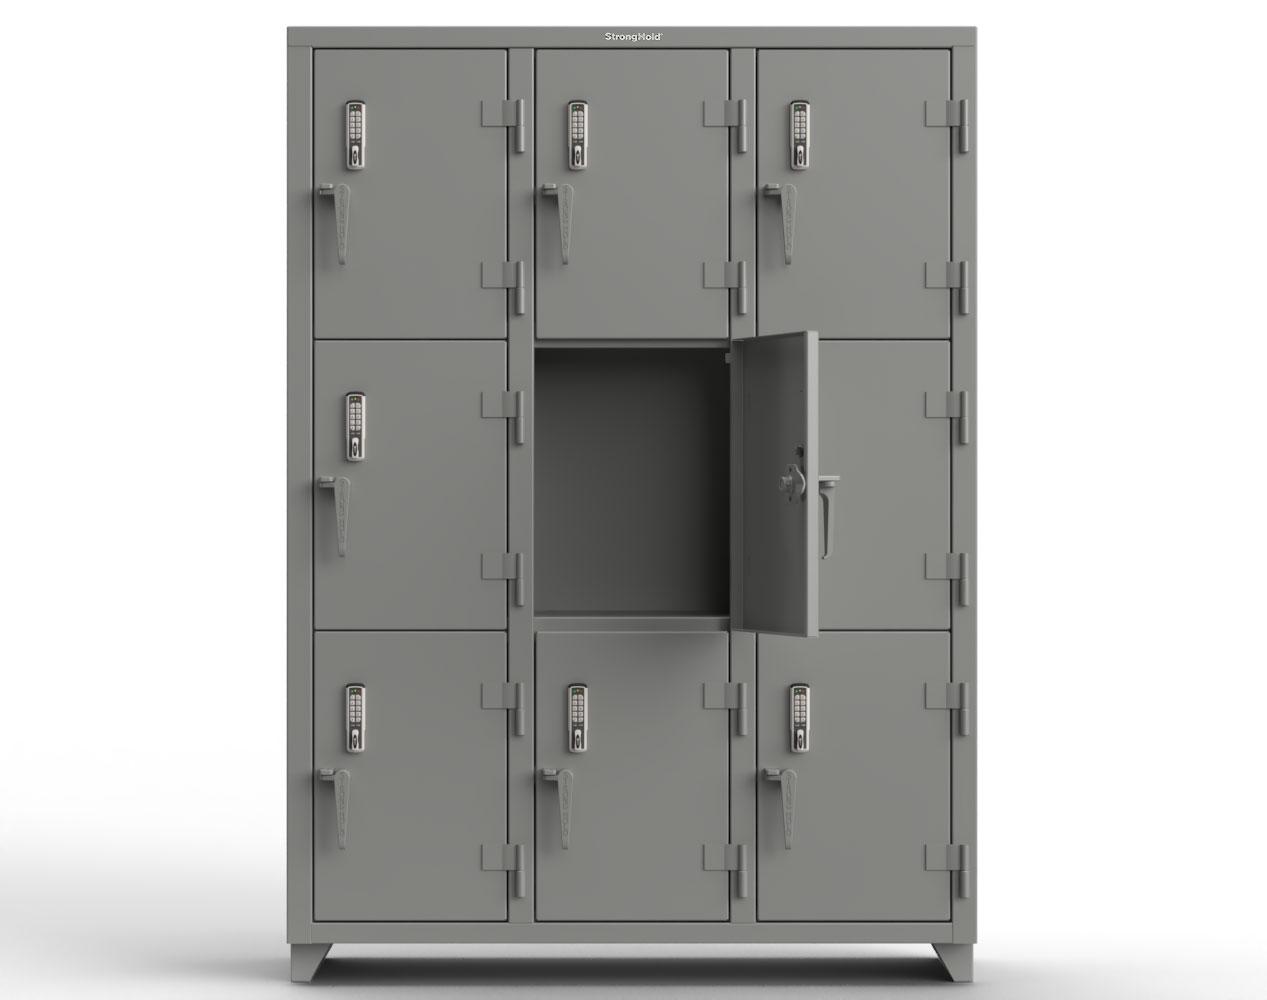 Extra Heavy Duty 14 GA Triple-Tier Locker with Keyless Entry Lock, 9 Compartments – 54 in. W x 18 in. D x 75 in. H